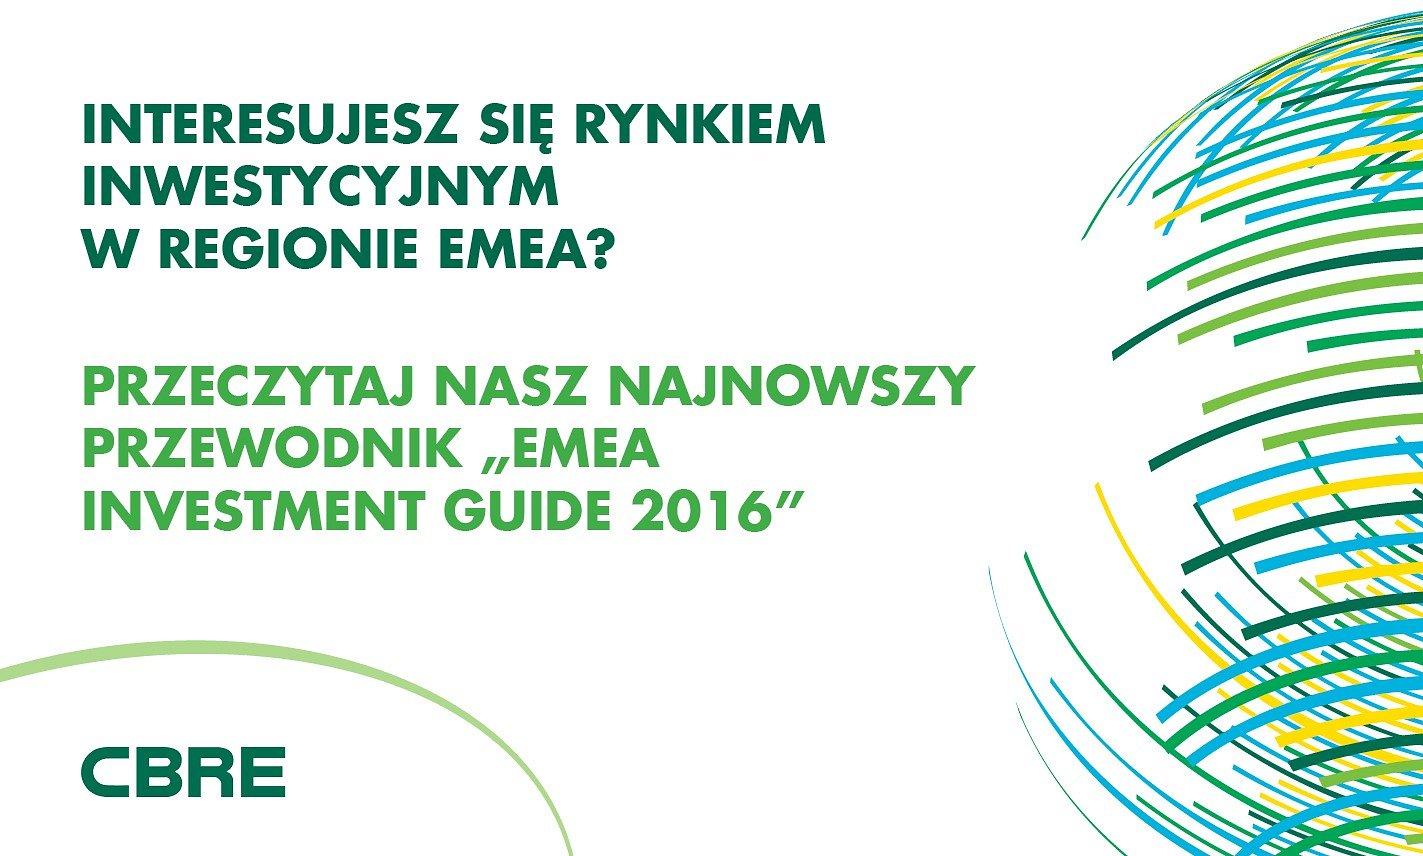 CBRE OPRACOWAŁO EMEA INVESTMENT GUIDE 2016